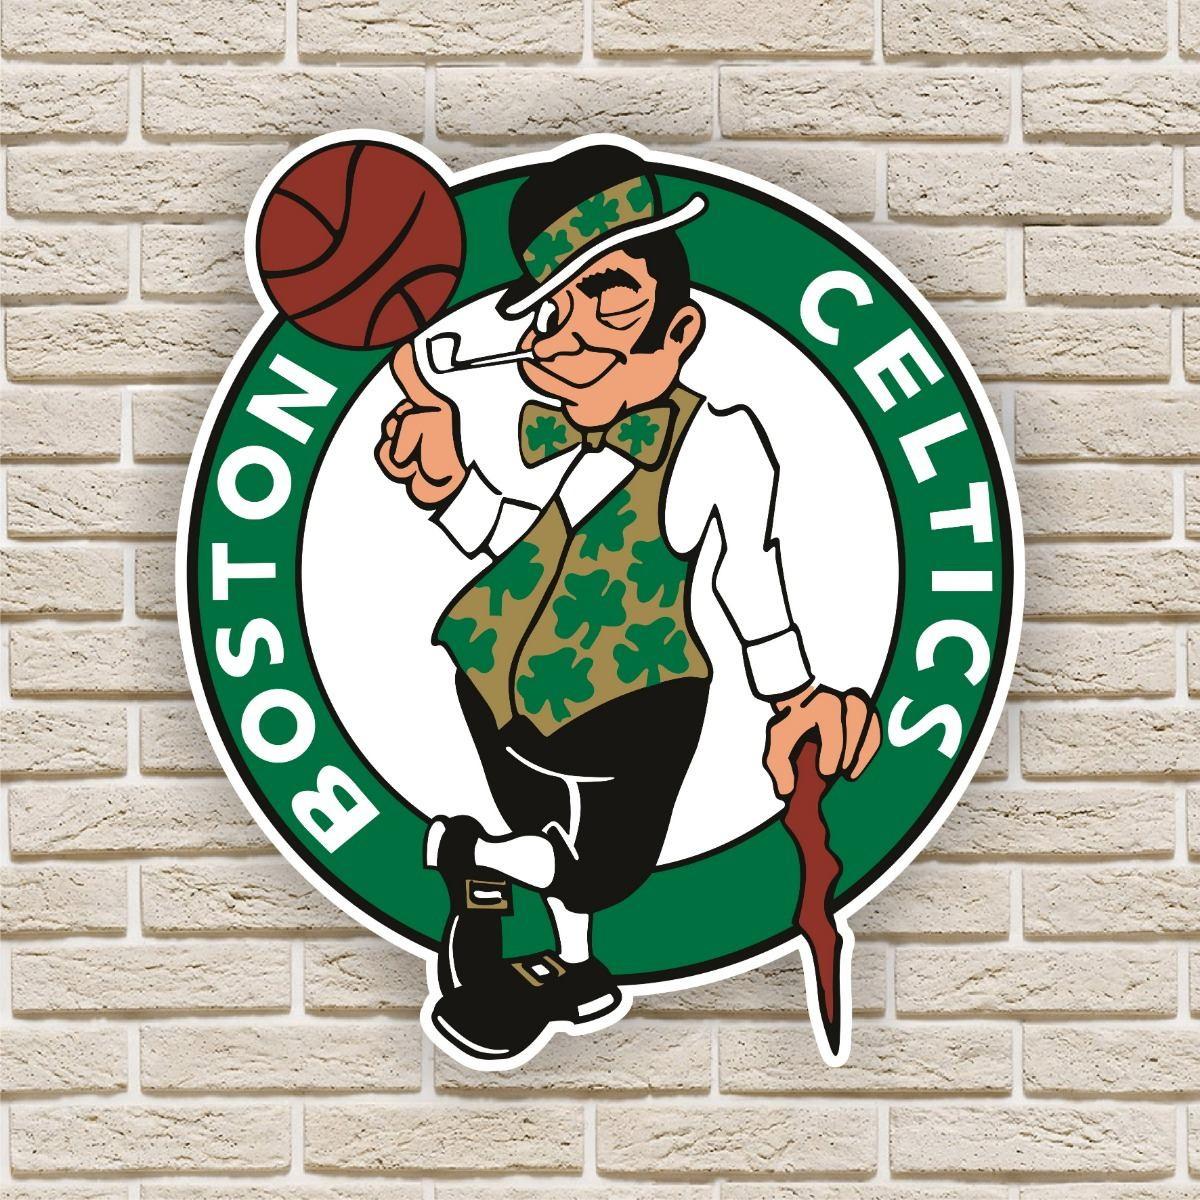 cab51cf90 Quadro Decorativo Boston Celtics Nba Basquete no Elo7